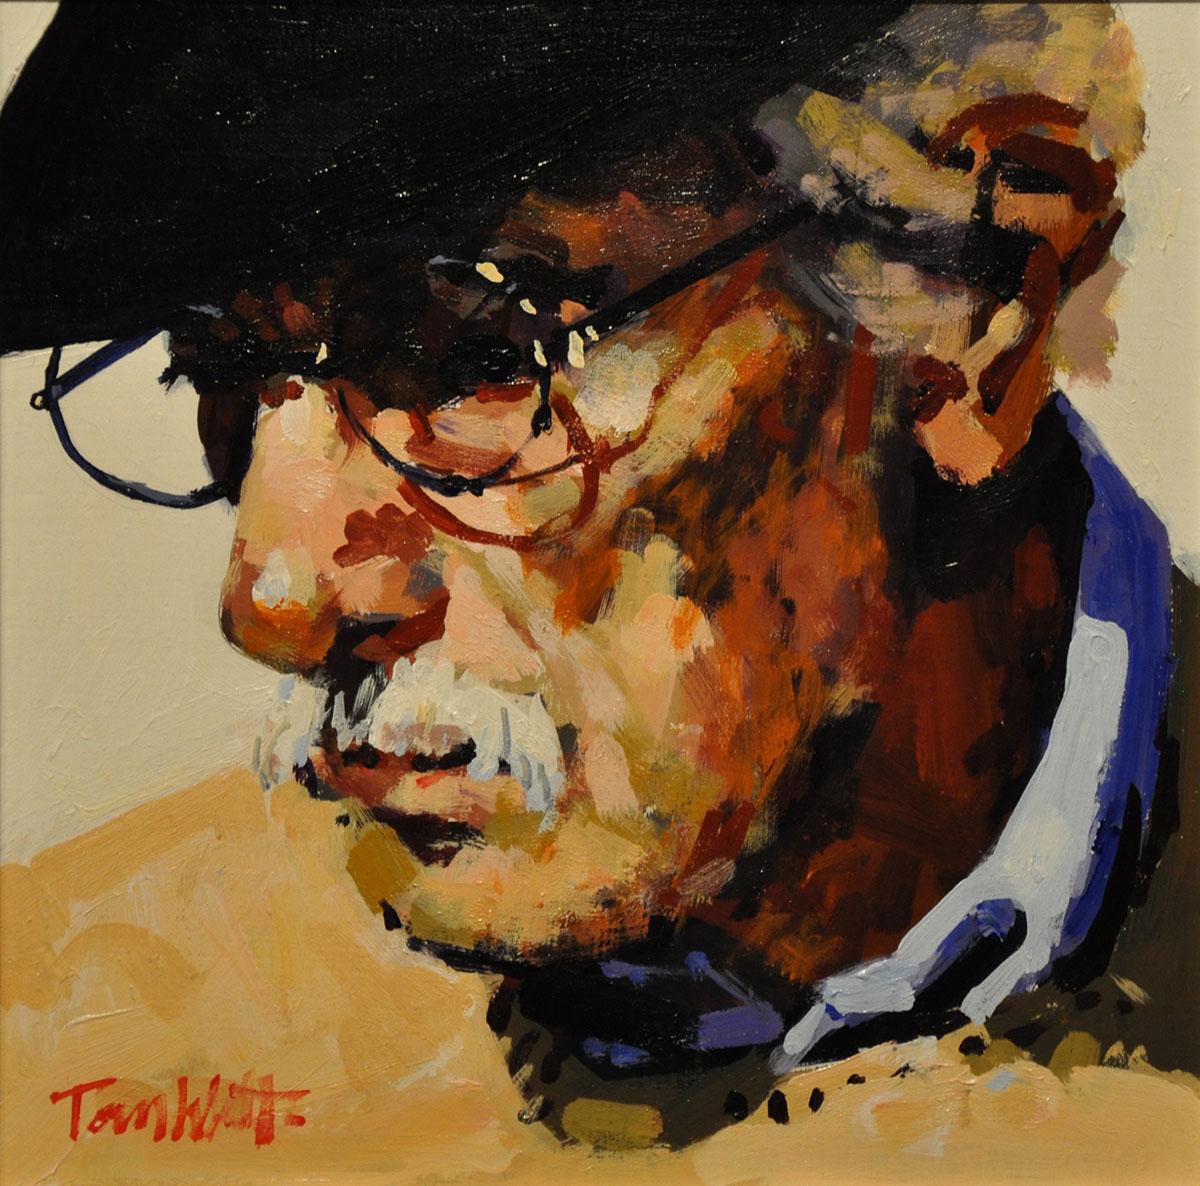 The Torrance Gallery: Tom Watt